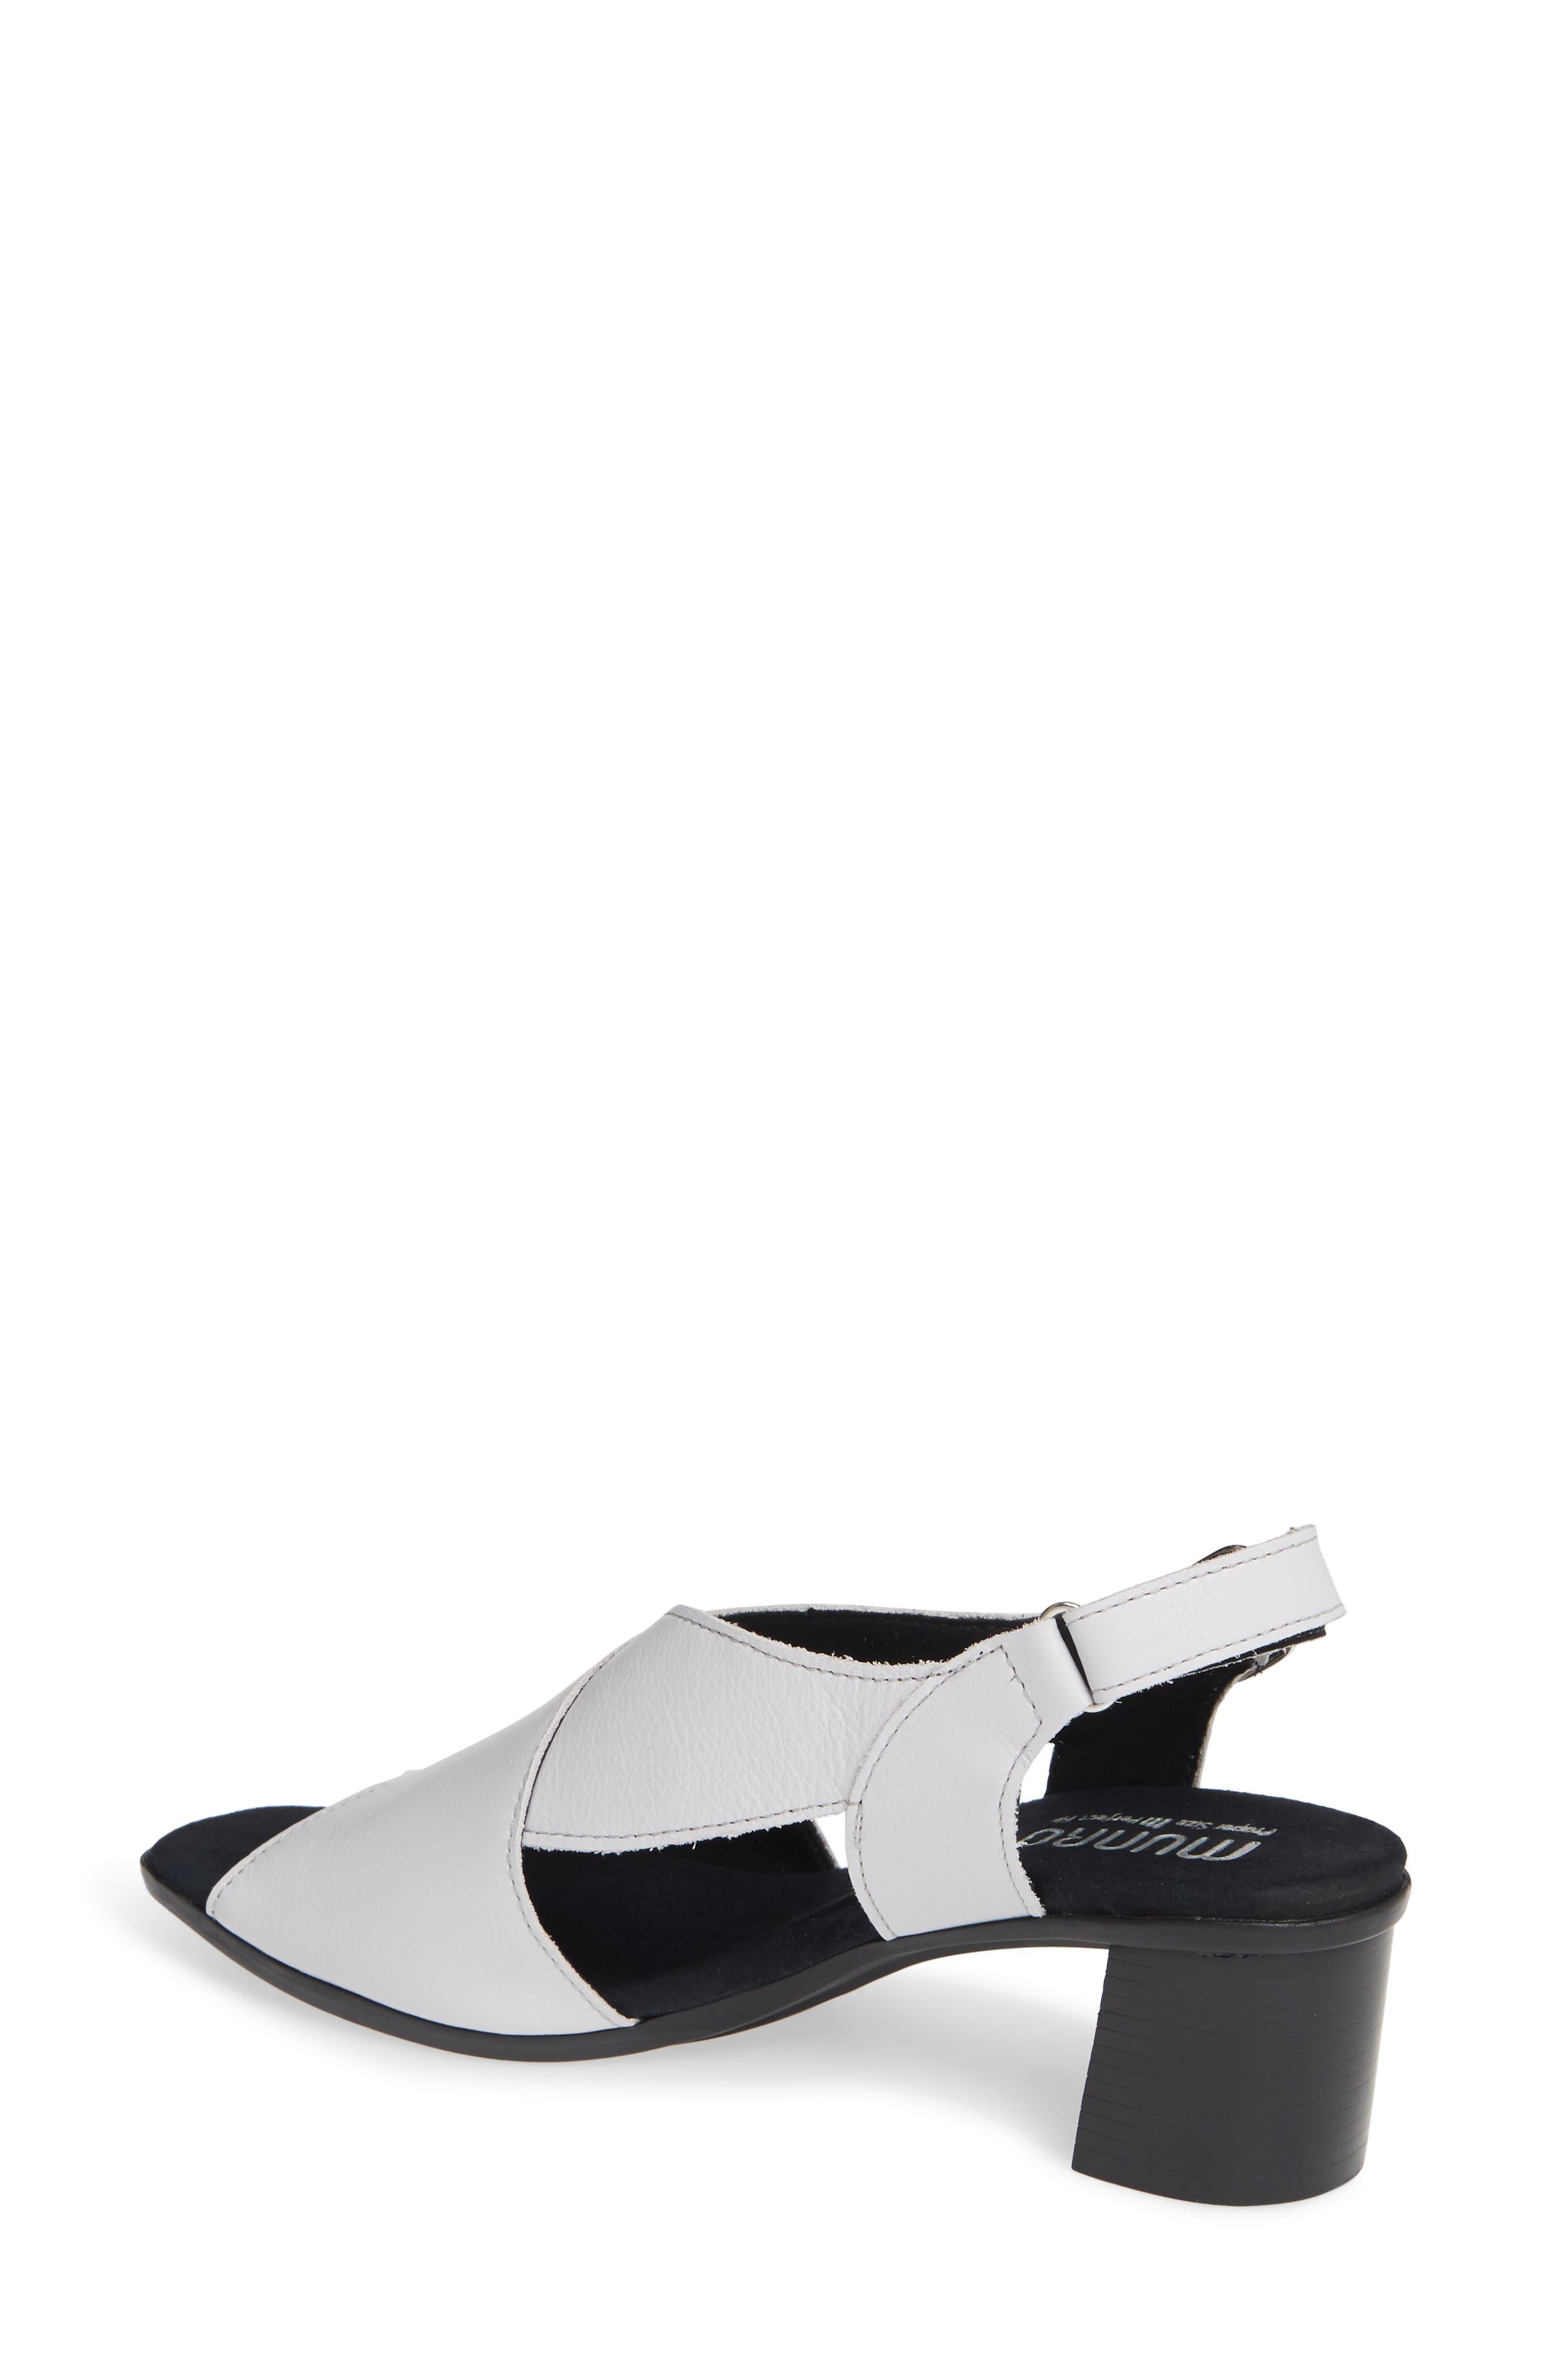 Laine Block Heel Sandal,                             Alternate thumbnail 2, color,                             WHITE LEATHER